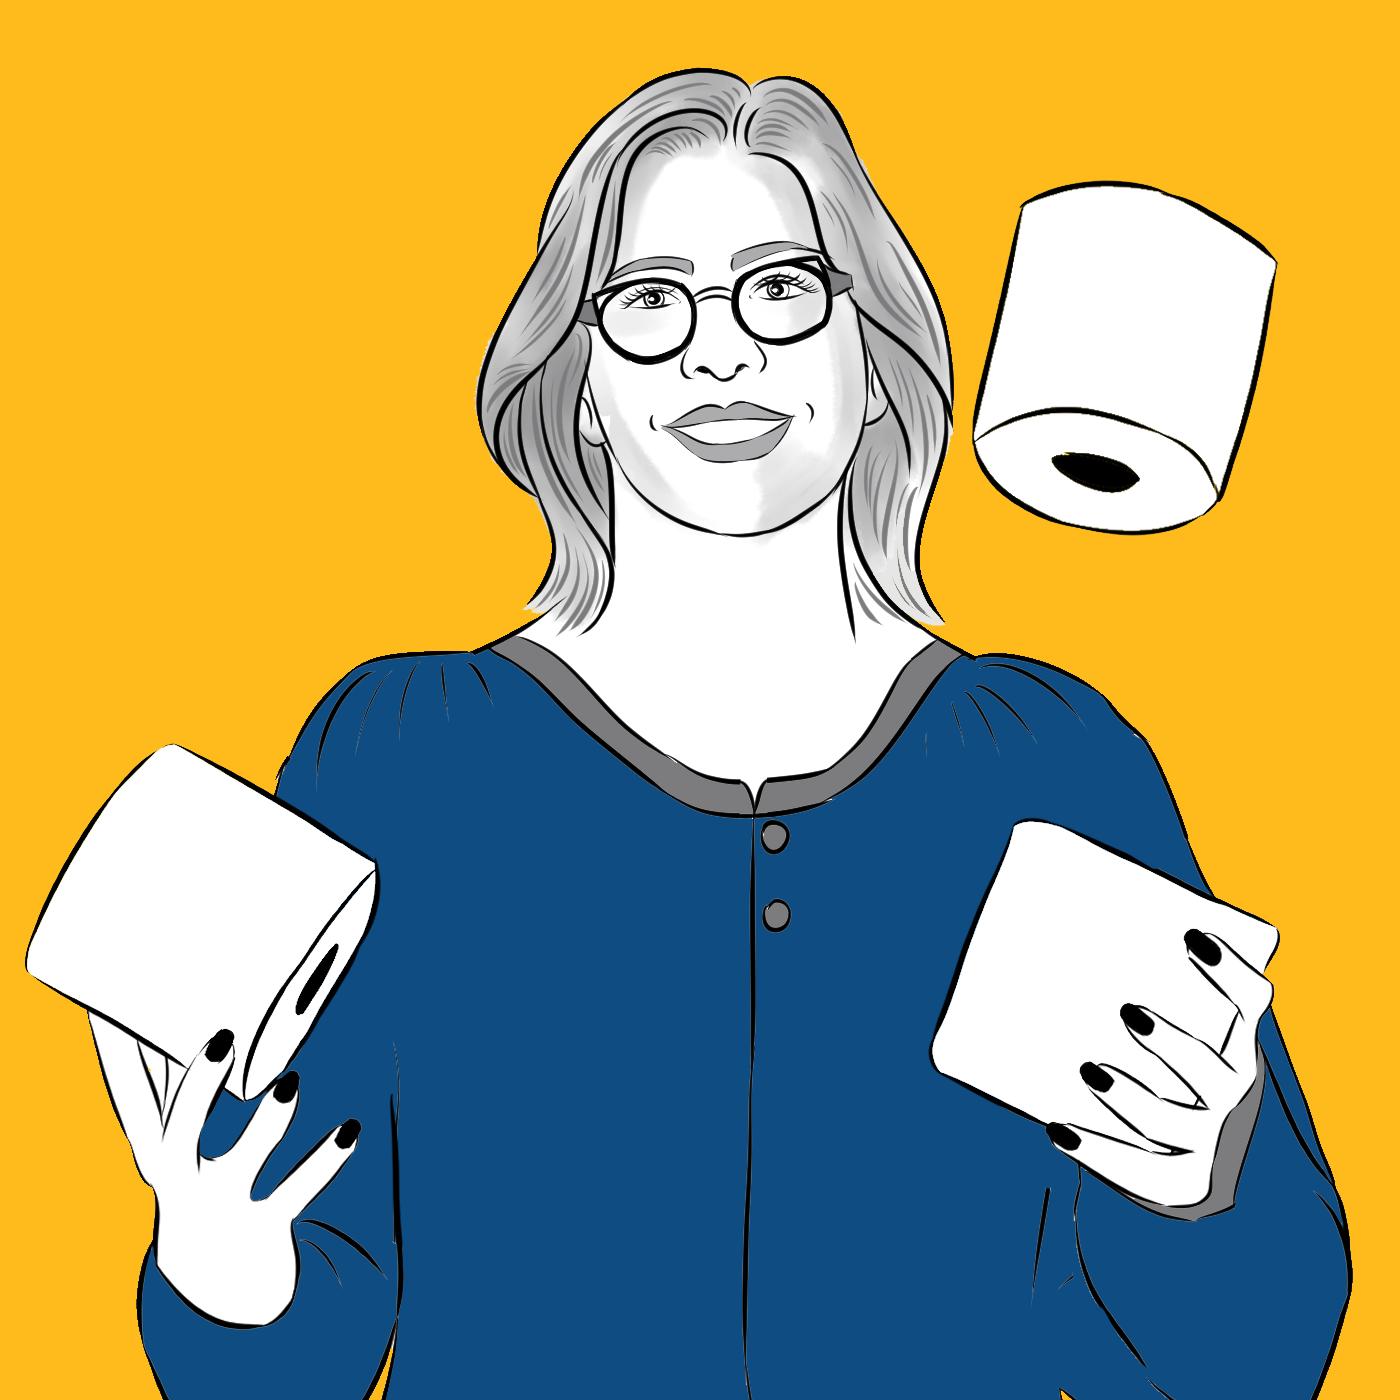 Episode 34 with CAROLINE ROUX: Juggling the Psychology of Scarcity